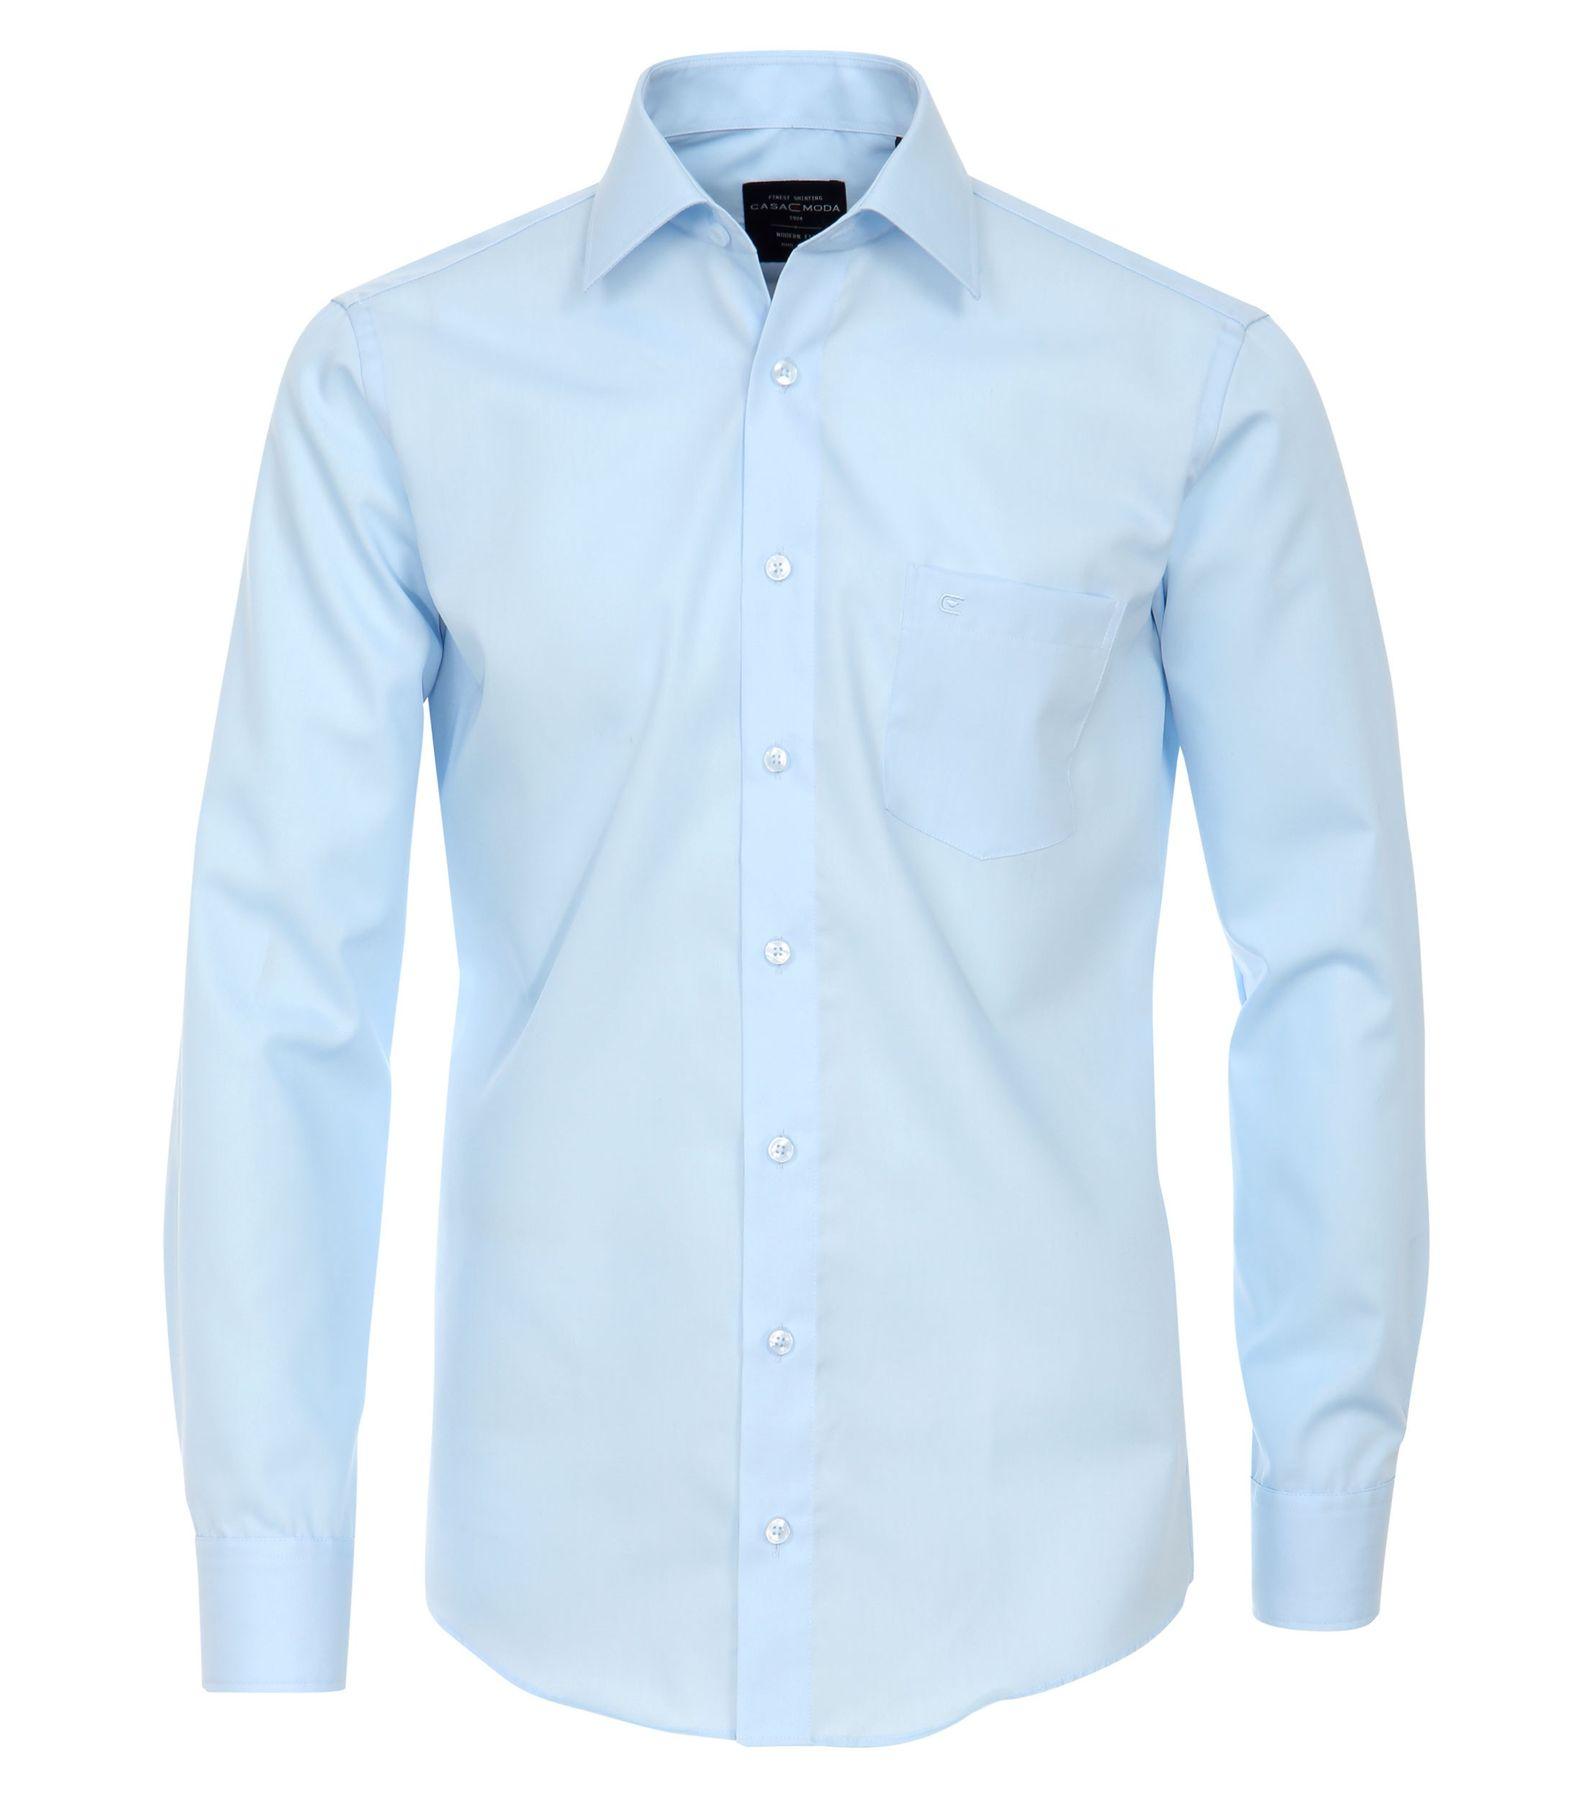 Casa Moda - Modern Fit - Bügelfreies Herren Business langarm Hemd in verschiedene Farben (006550) – Bild 11